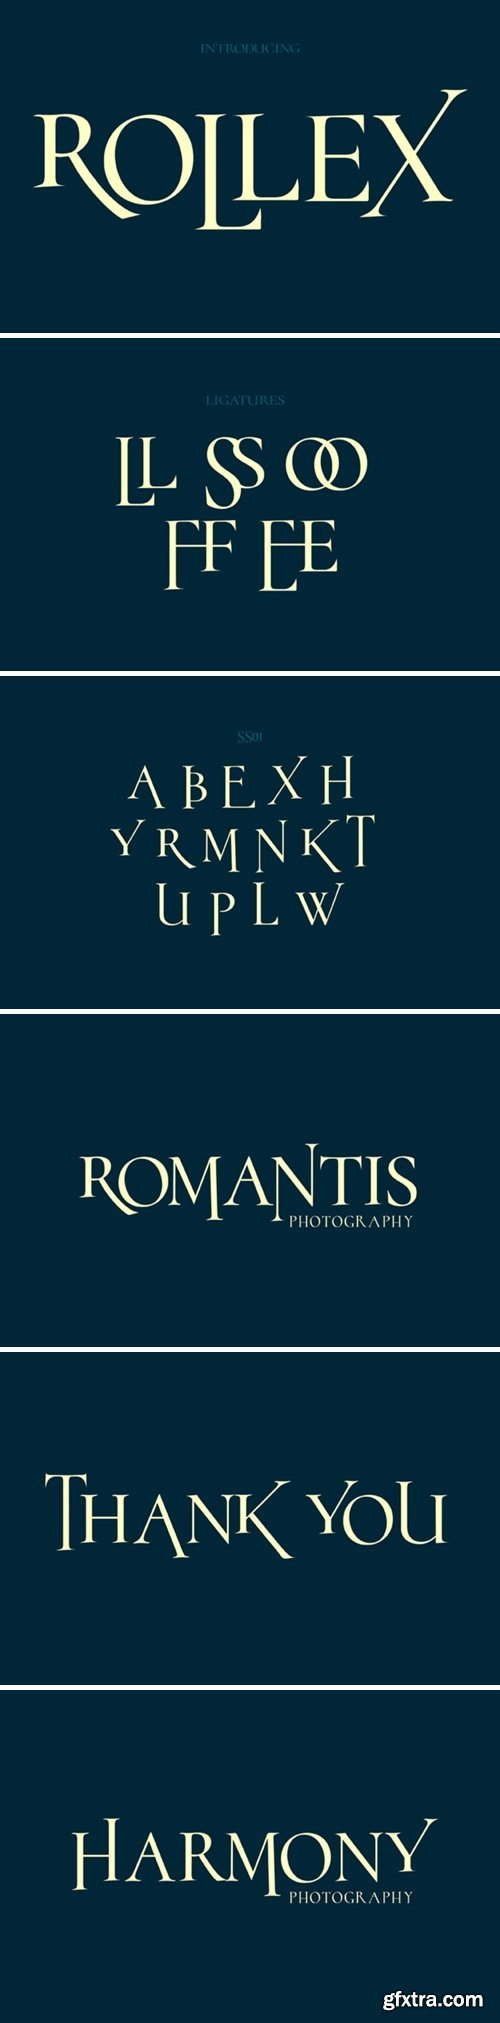 rollex font